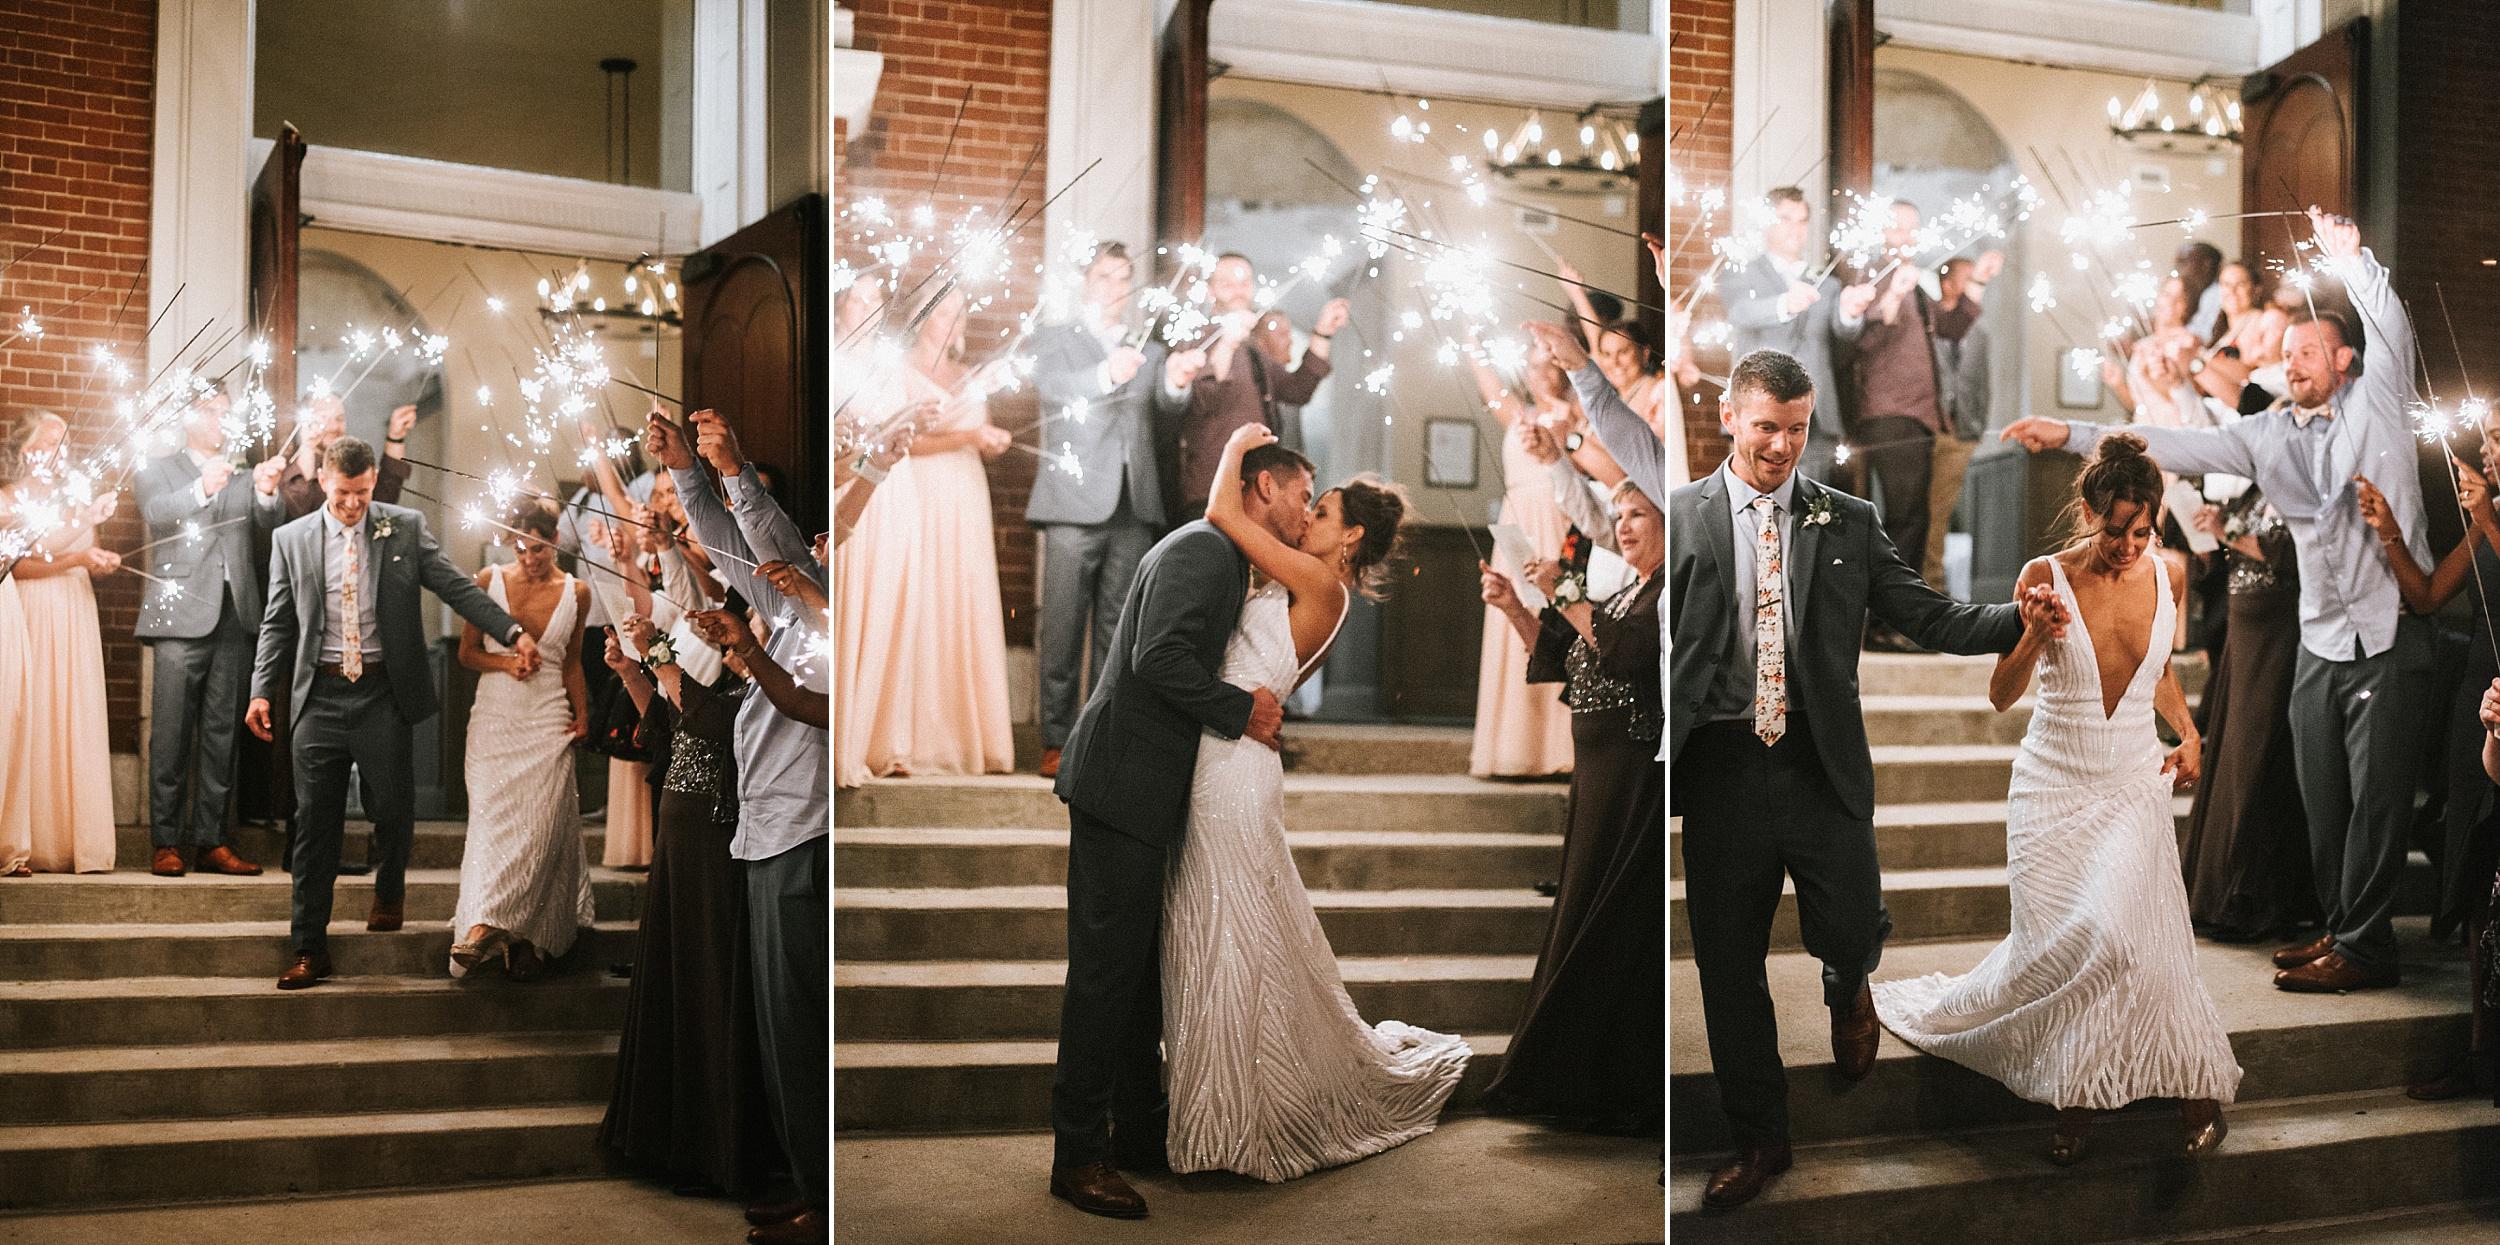 Brooke Townsend Photography - Cincinnati Wedding Photographer (170 of 170).jpg